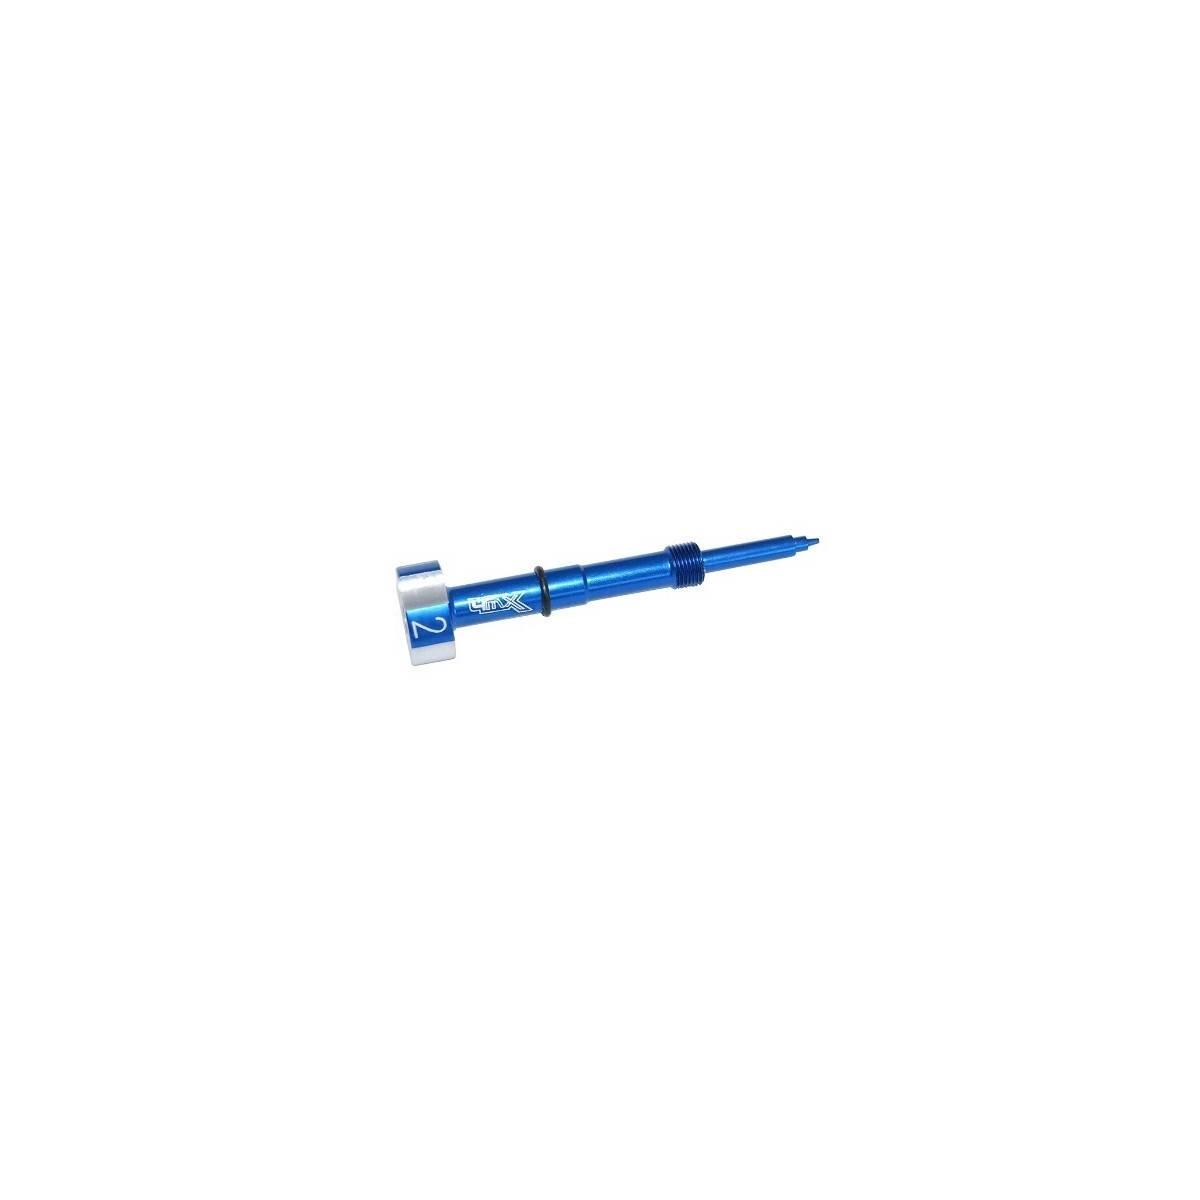 FMS01-AZ - Tornillo Mezcla Carburador 4Mx Azul